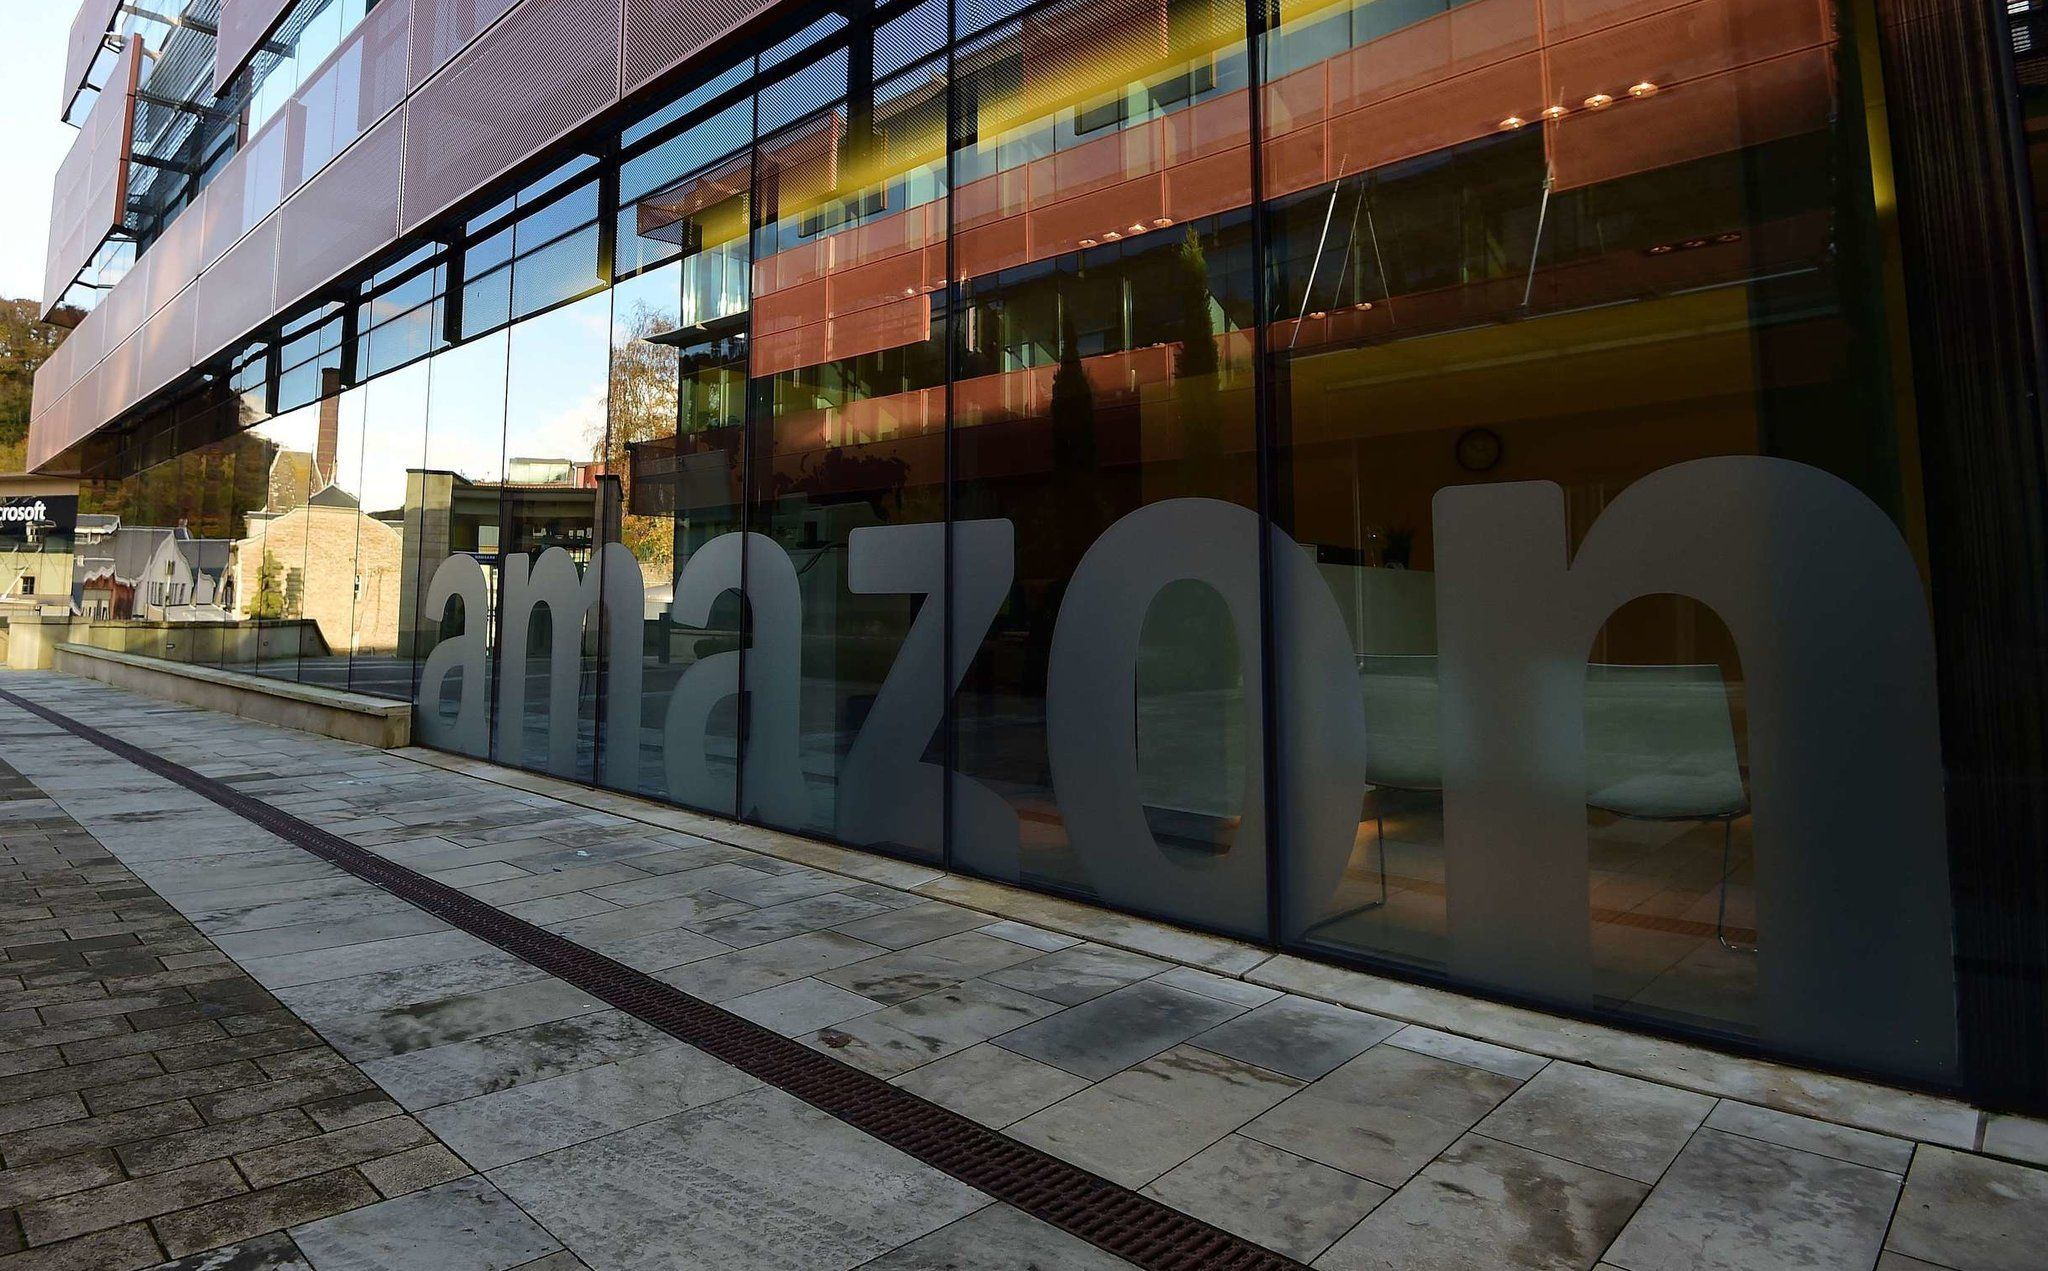 ЄС може накласти на Amazon штраф у $425 млн за порушення регламенту про захист даних